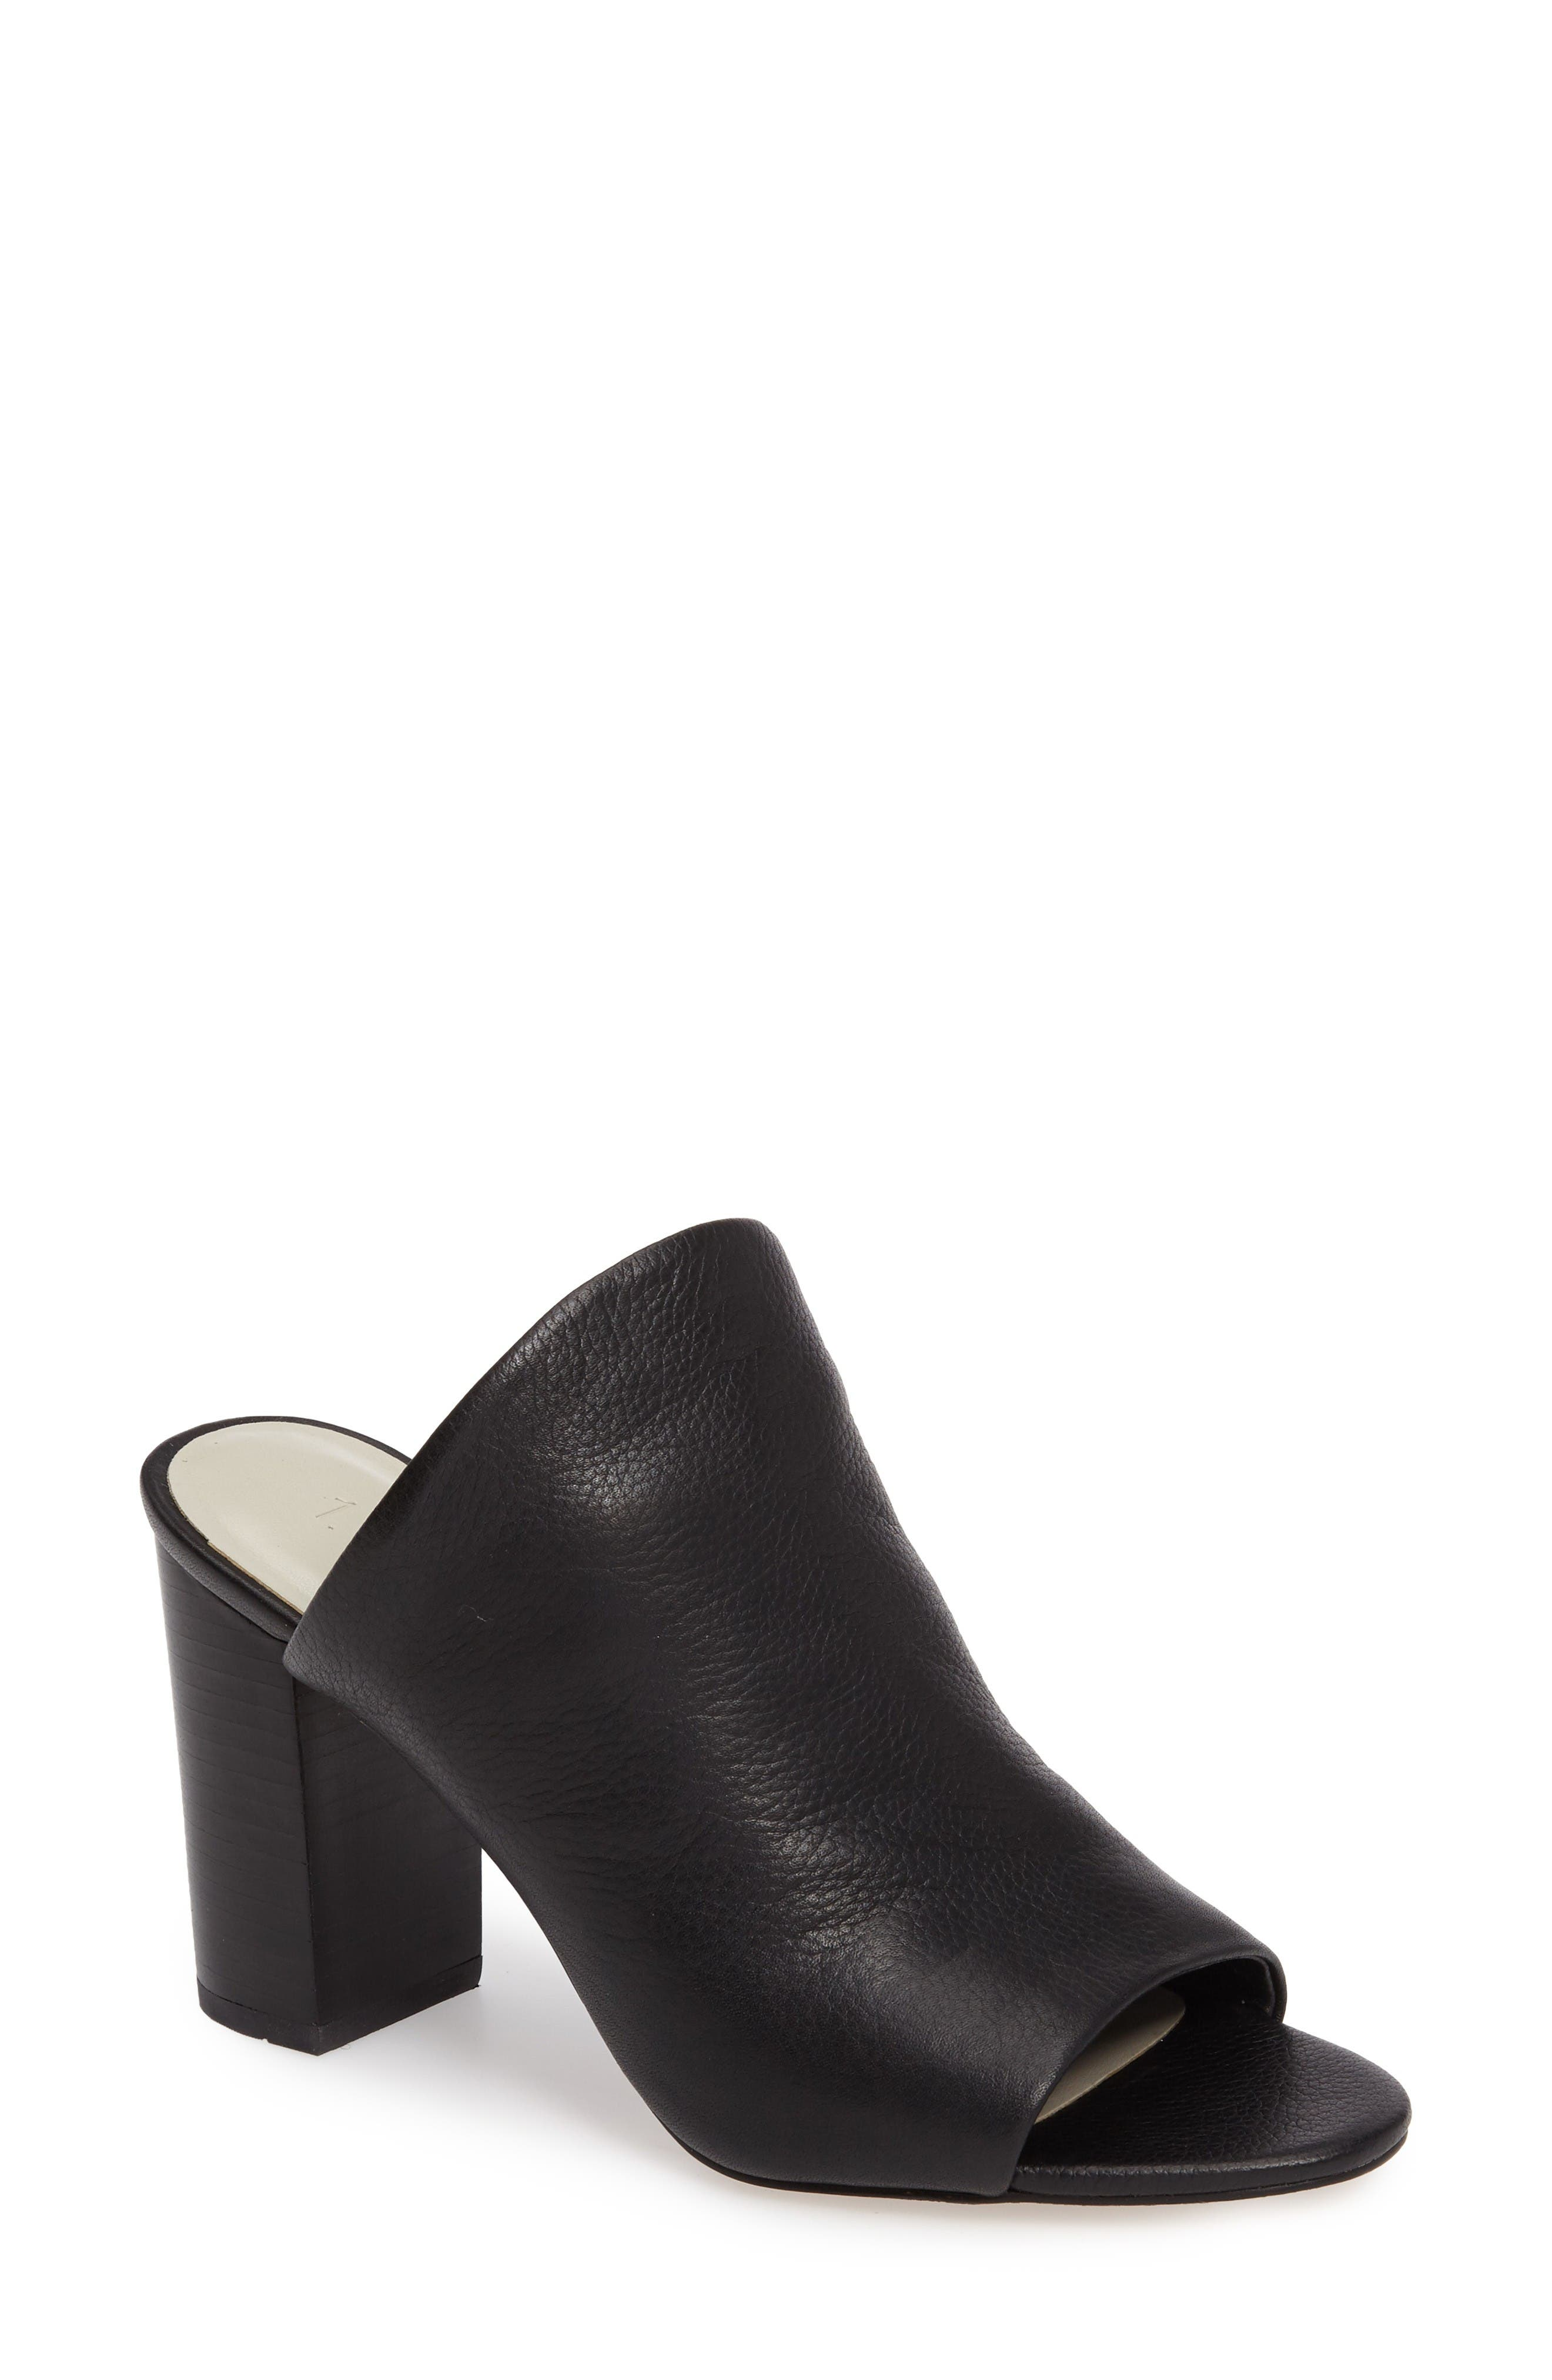 Sloan Mule,                         Main,                         color, Black Leather